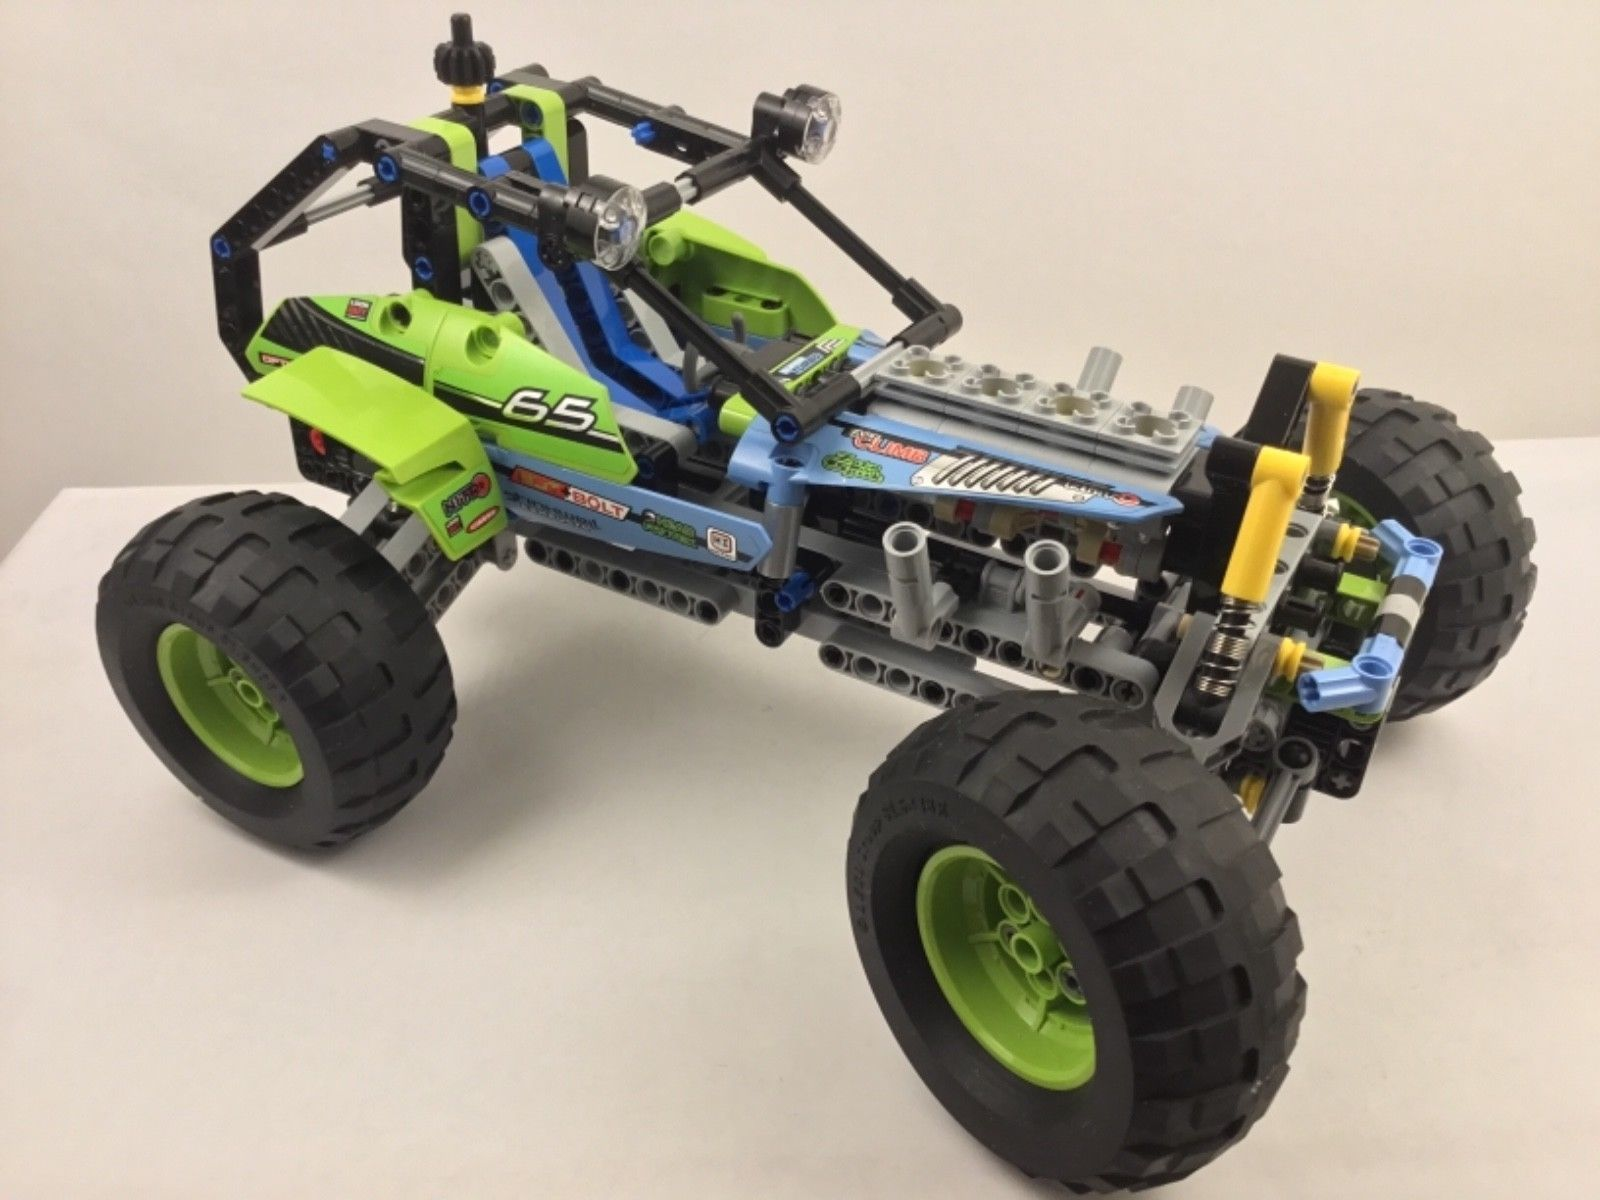 LEGO TECHNIC FORMULA OFF-ROADER BUILDING SET 42037 | LEGO